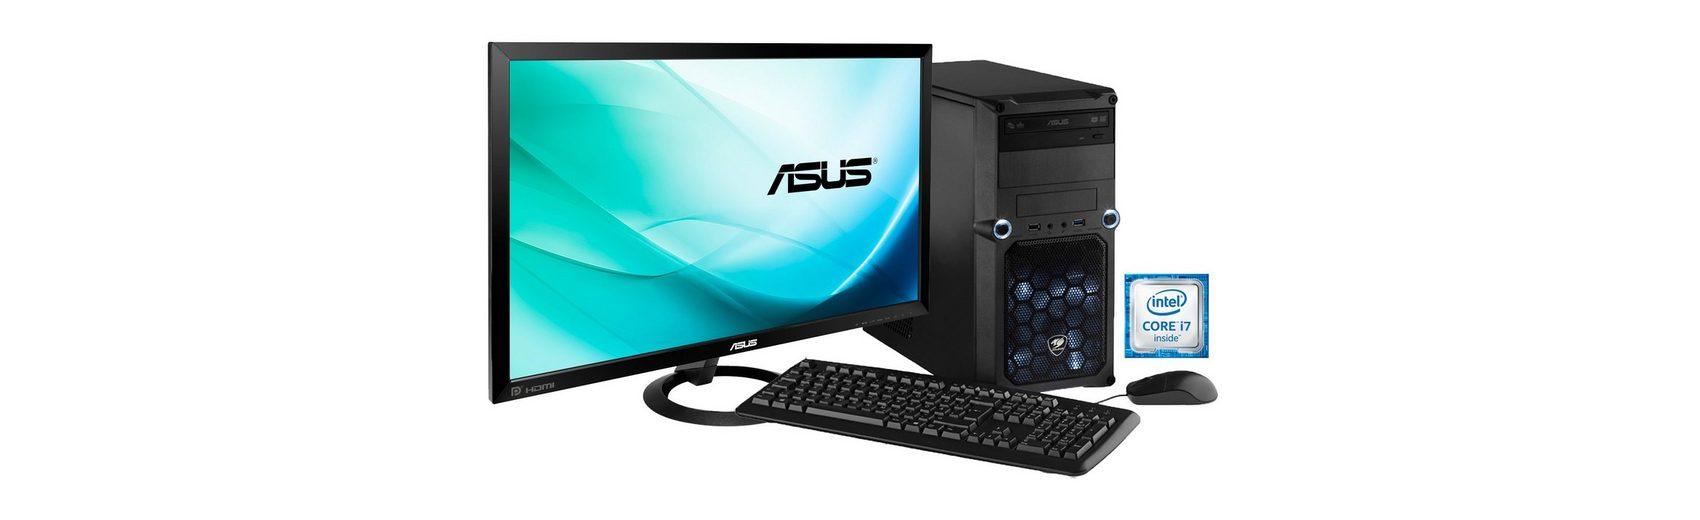 Hyrican Gaming PC Set Intel® i7-6700, 16GB, Windows 10 + Monitor »Cyber Gamer SET01074 «